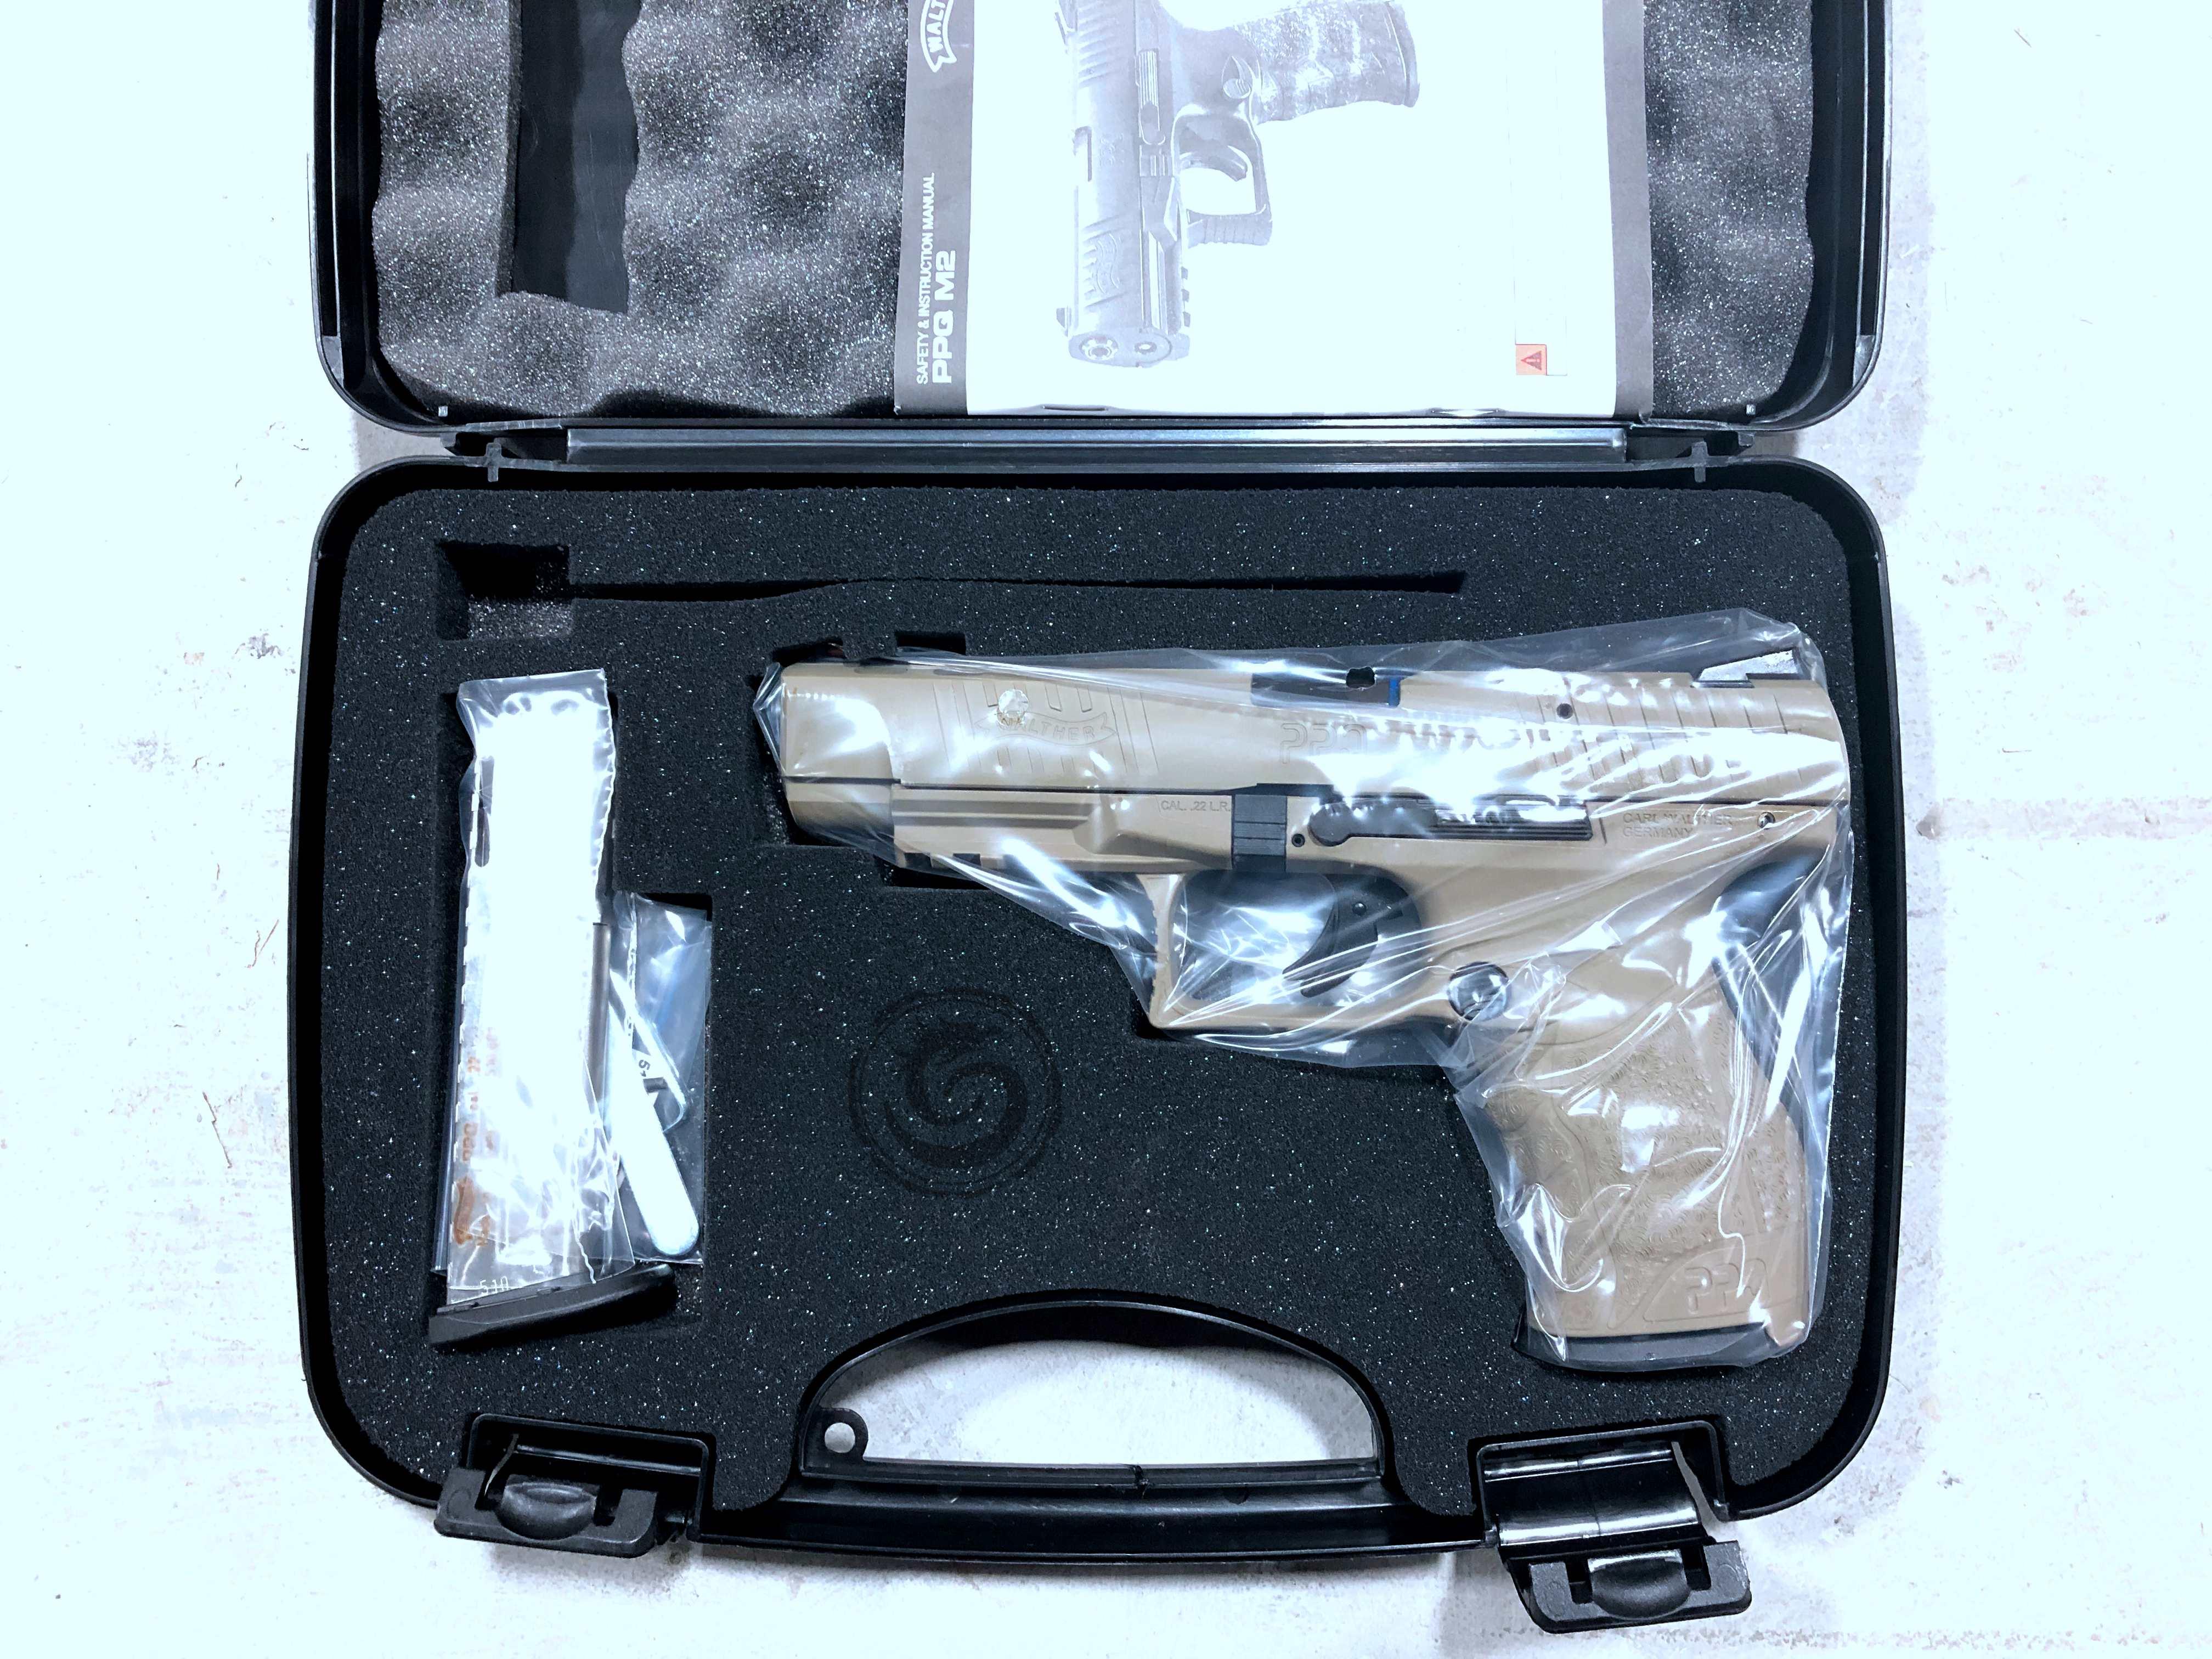 Walther PPQ M2 Pistol 22LR 5